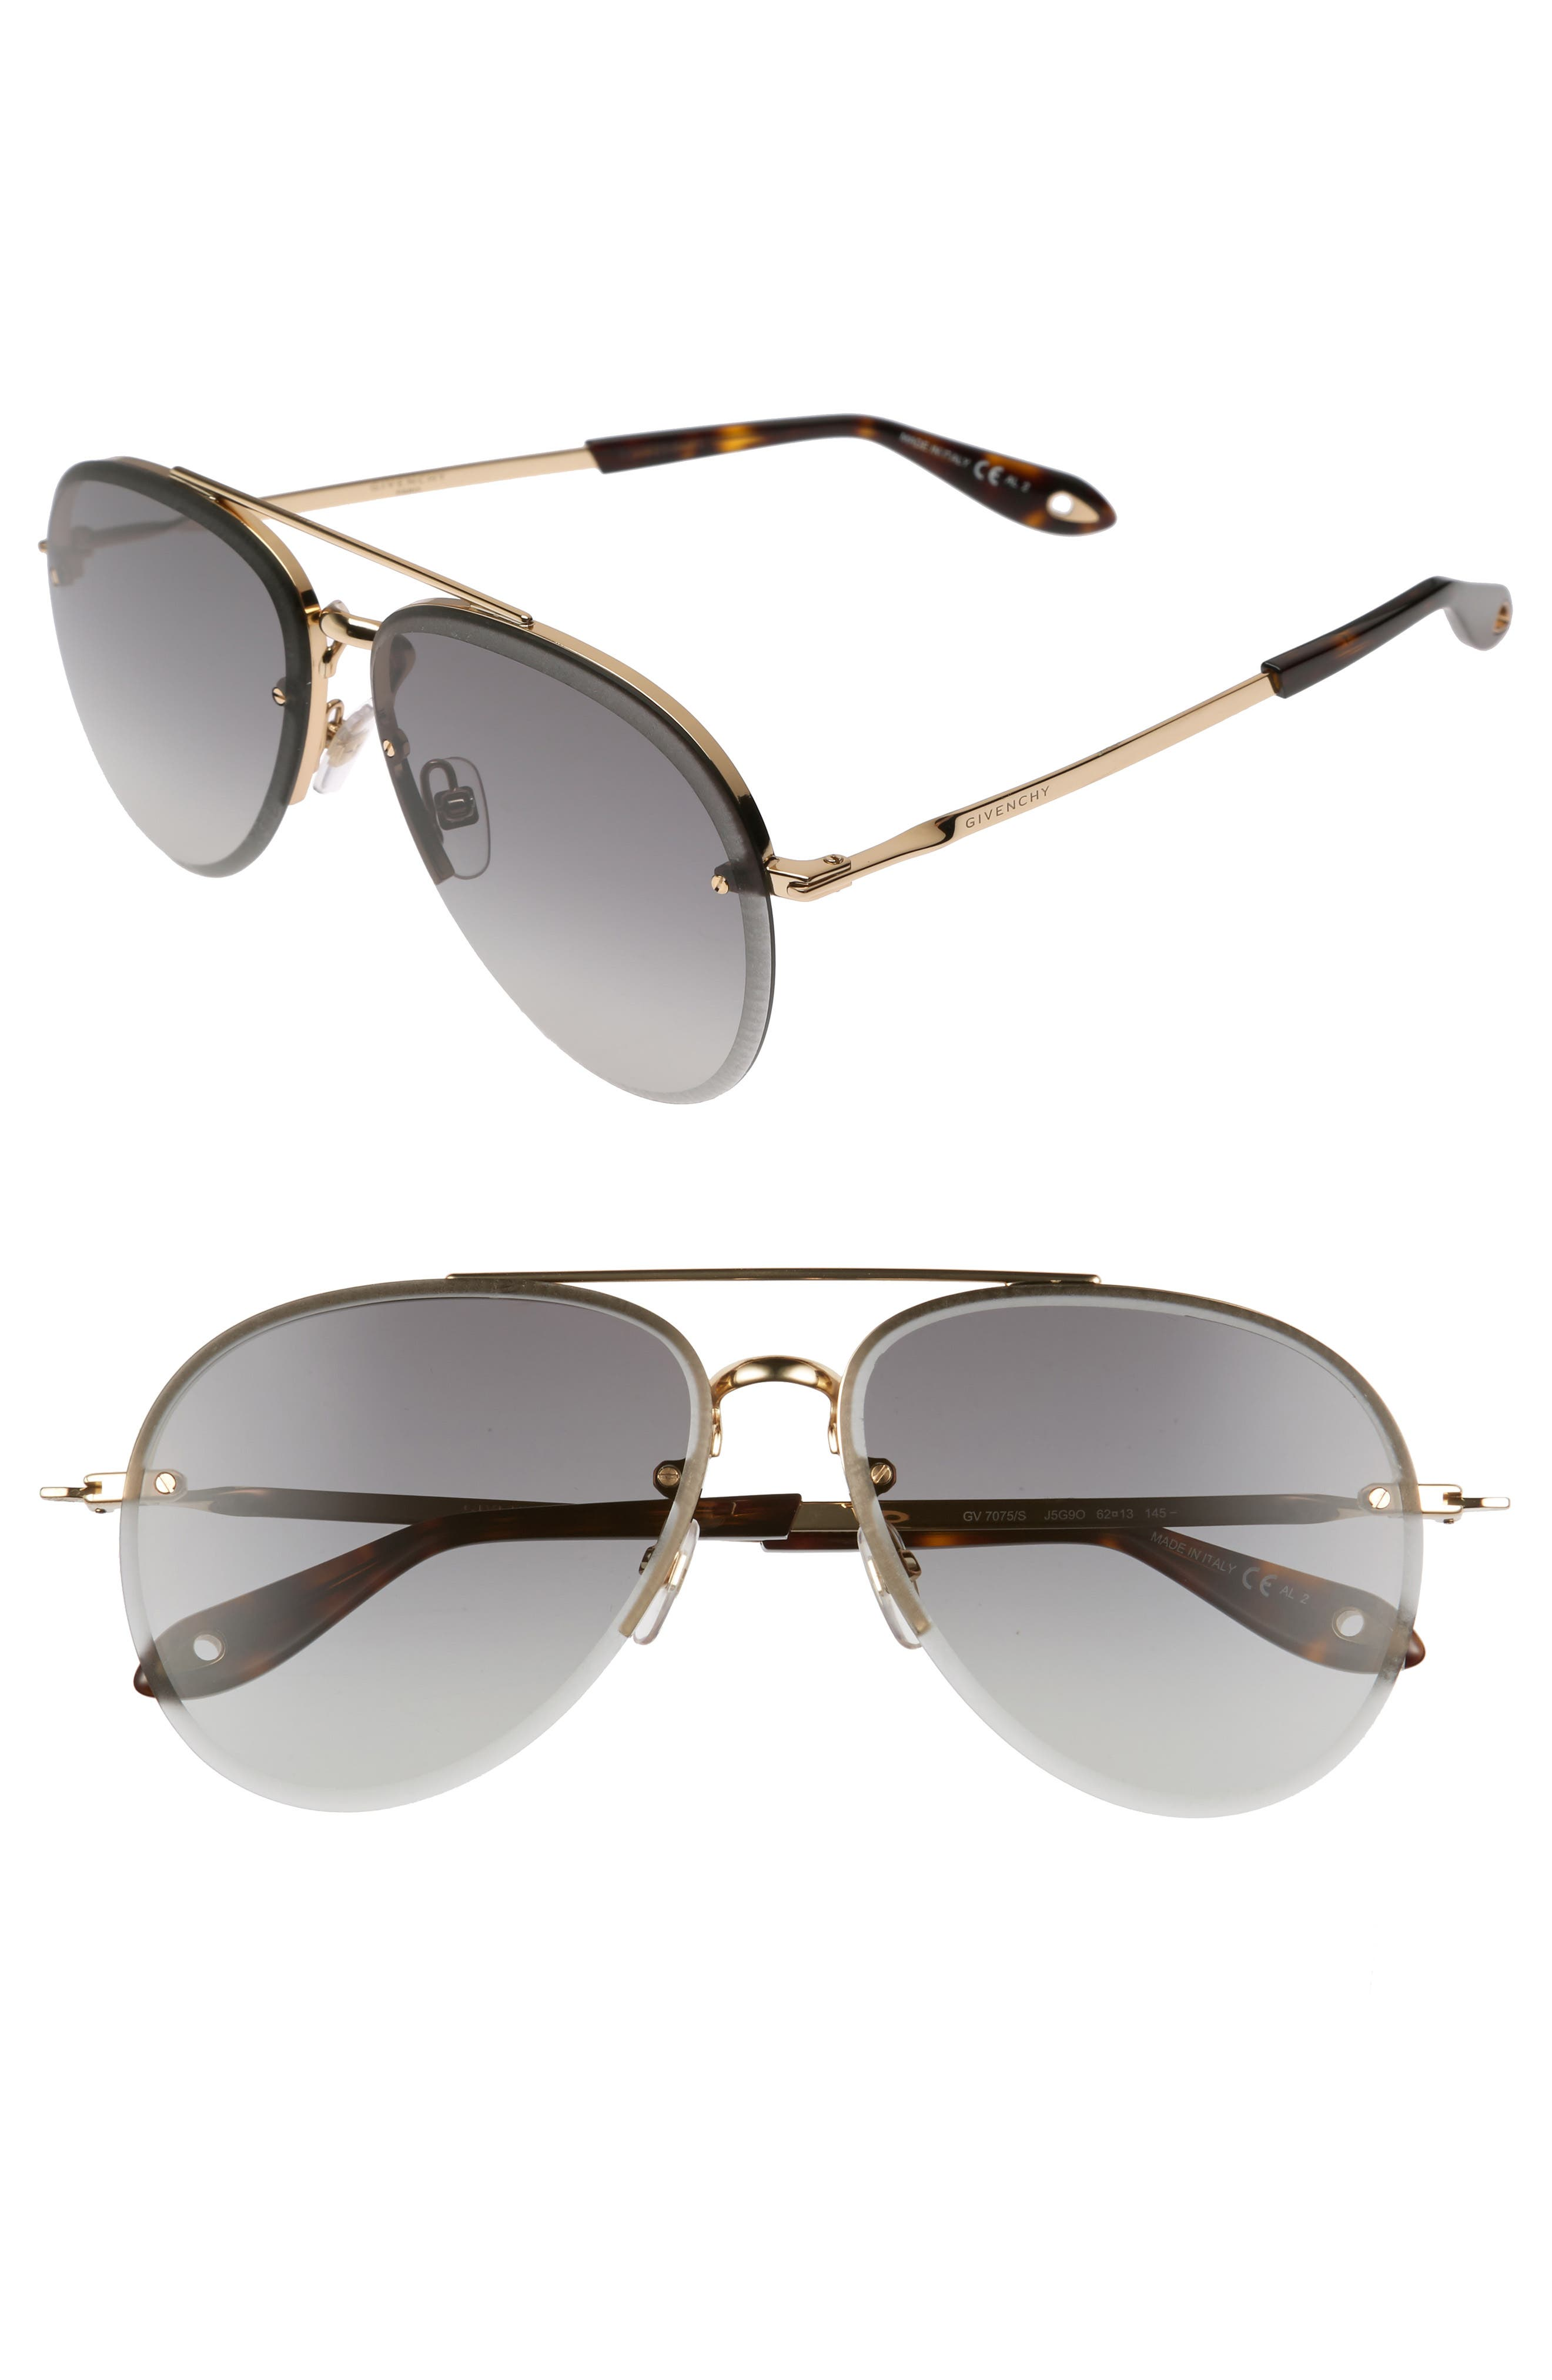 62mm Oversize Aviator Sunglasses,                         Main,                         color, Gold